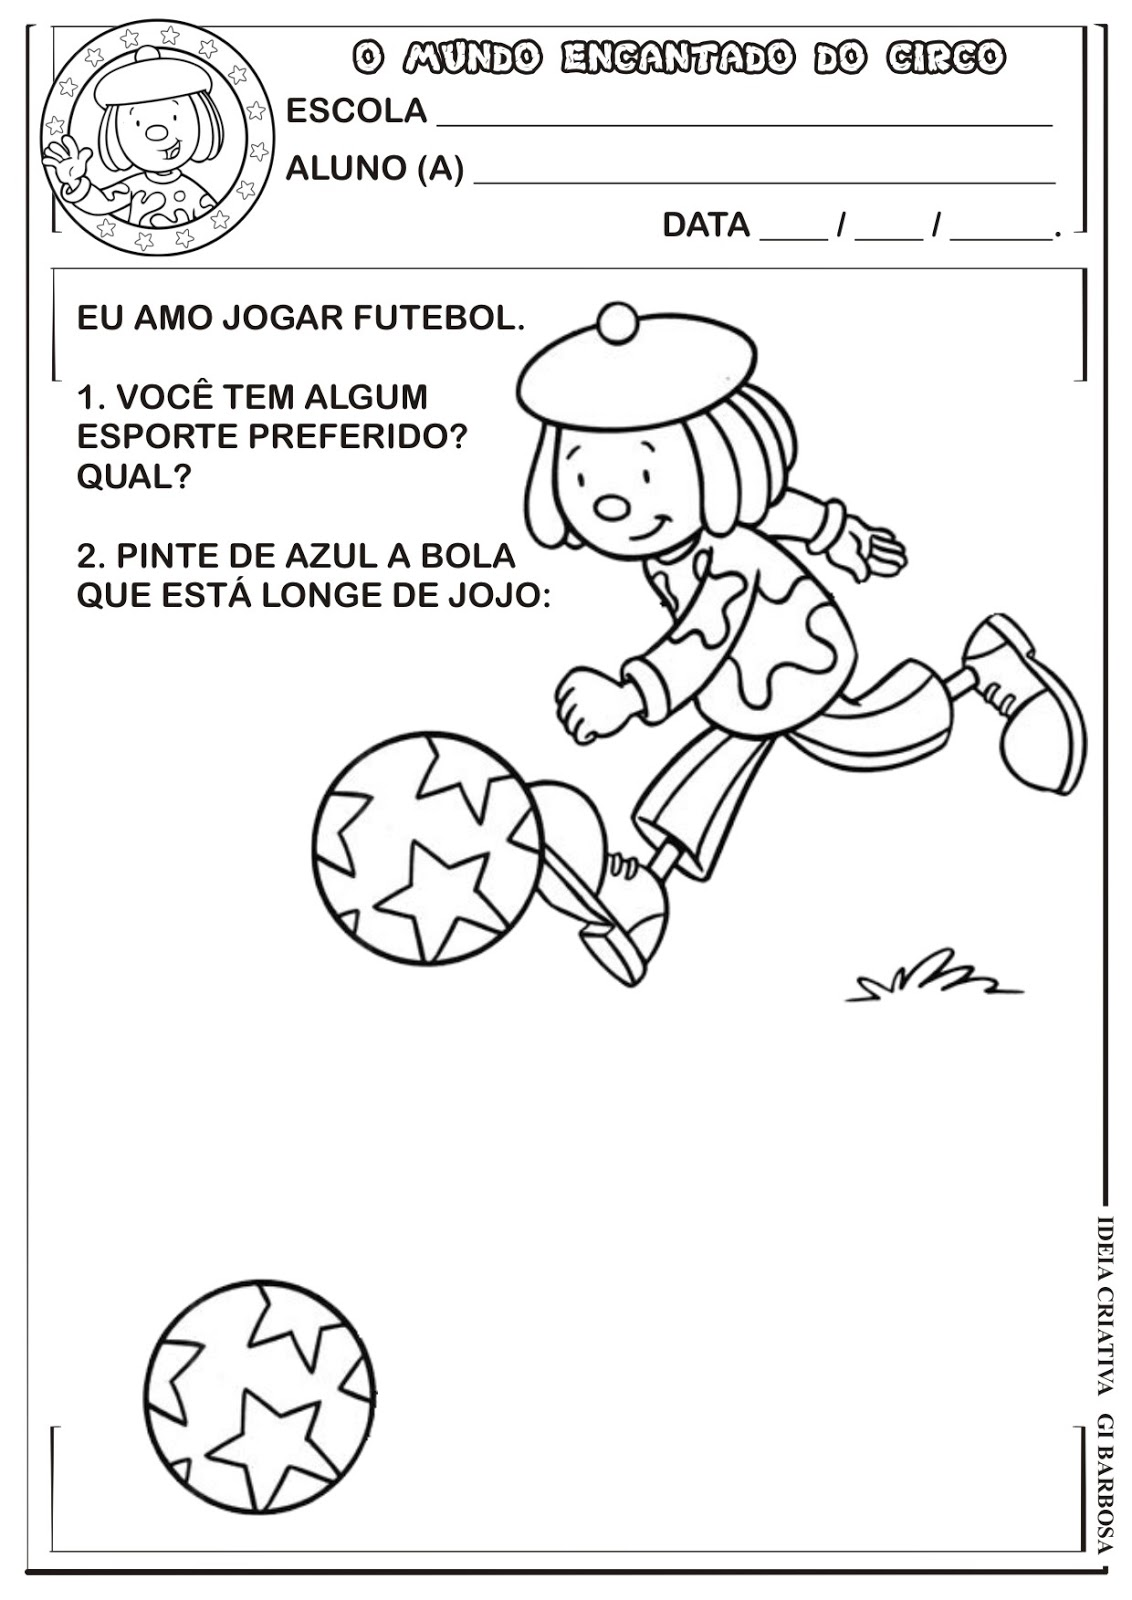 Famosos Atividade Projeto Circo Conceito | Ideia Criativa - Gi Barbosa  OS33